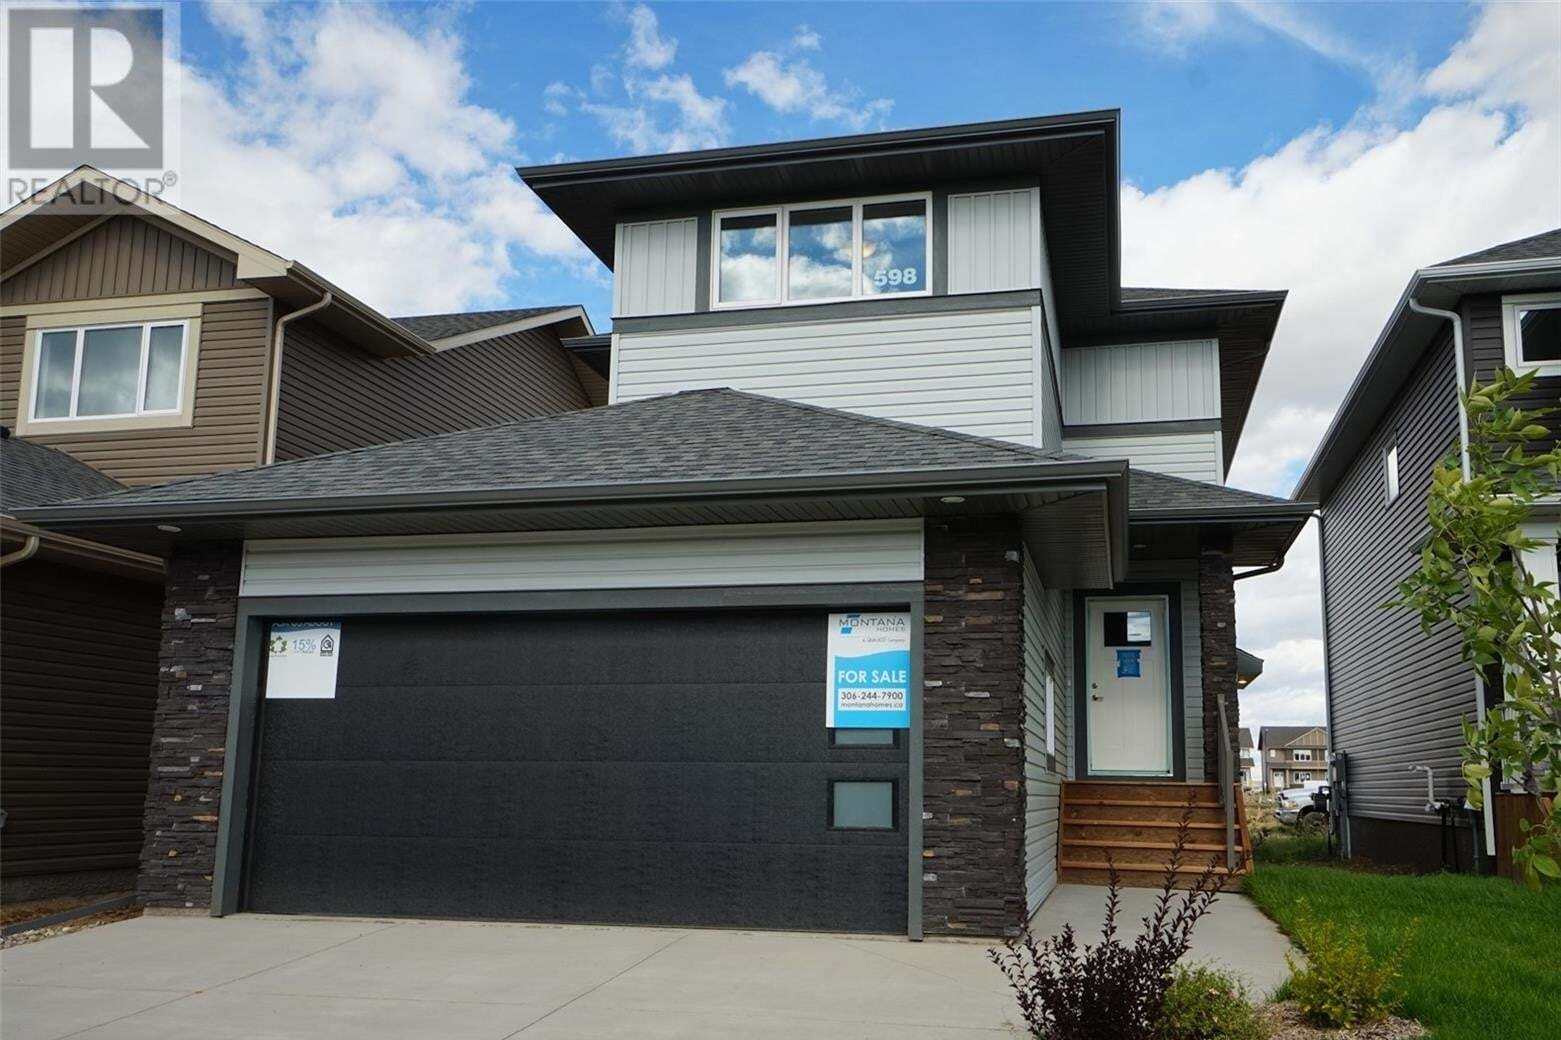 House for sale at 598 Mcfaull Cres Saskatoon Saskatchewan - MLS: SK826006